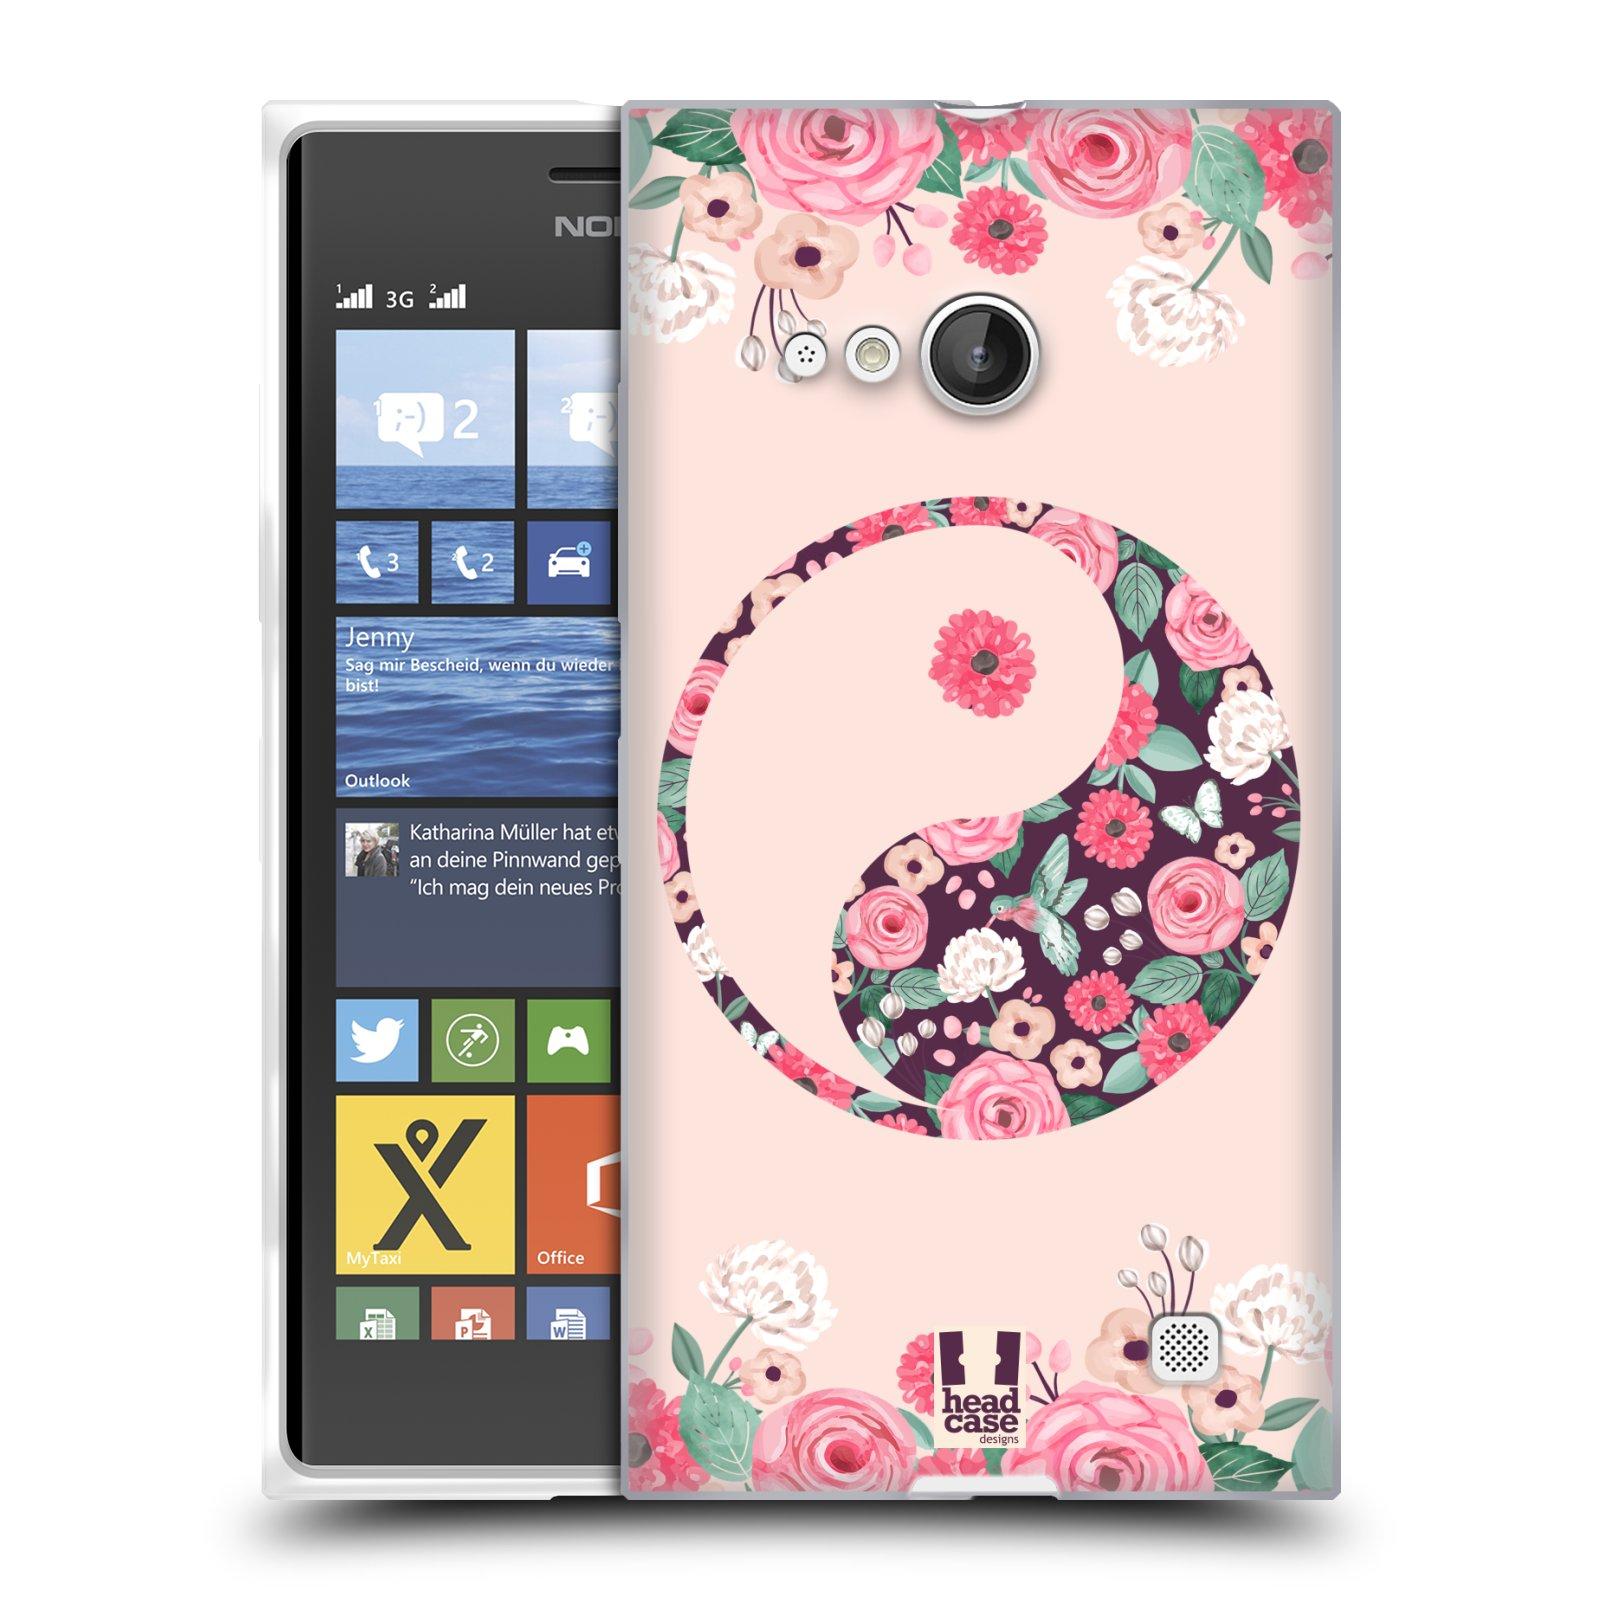 Silikonové pouzdro na mobil Nokia Lumia 730 Dual SIM HEAD CASE Yin a Yang Floral (Silikonový kryt či obal na mobilní telefon Nokia Lumia 730 Dual SIM)